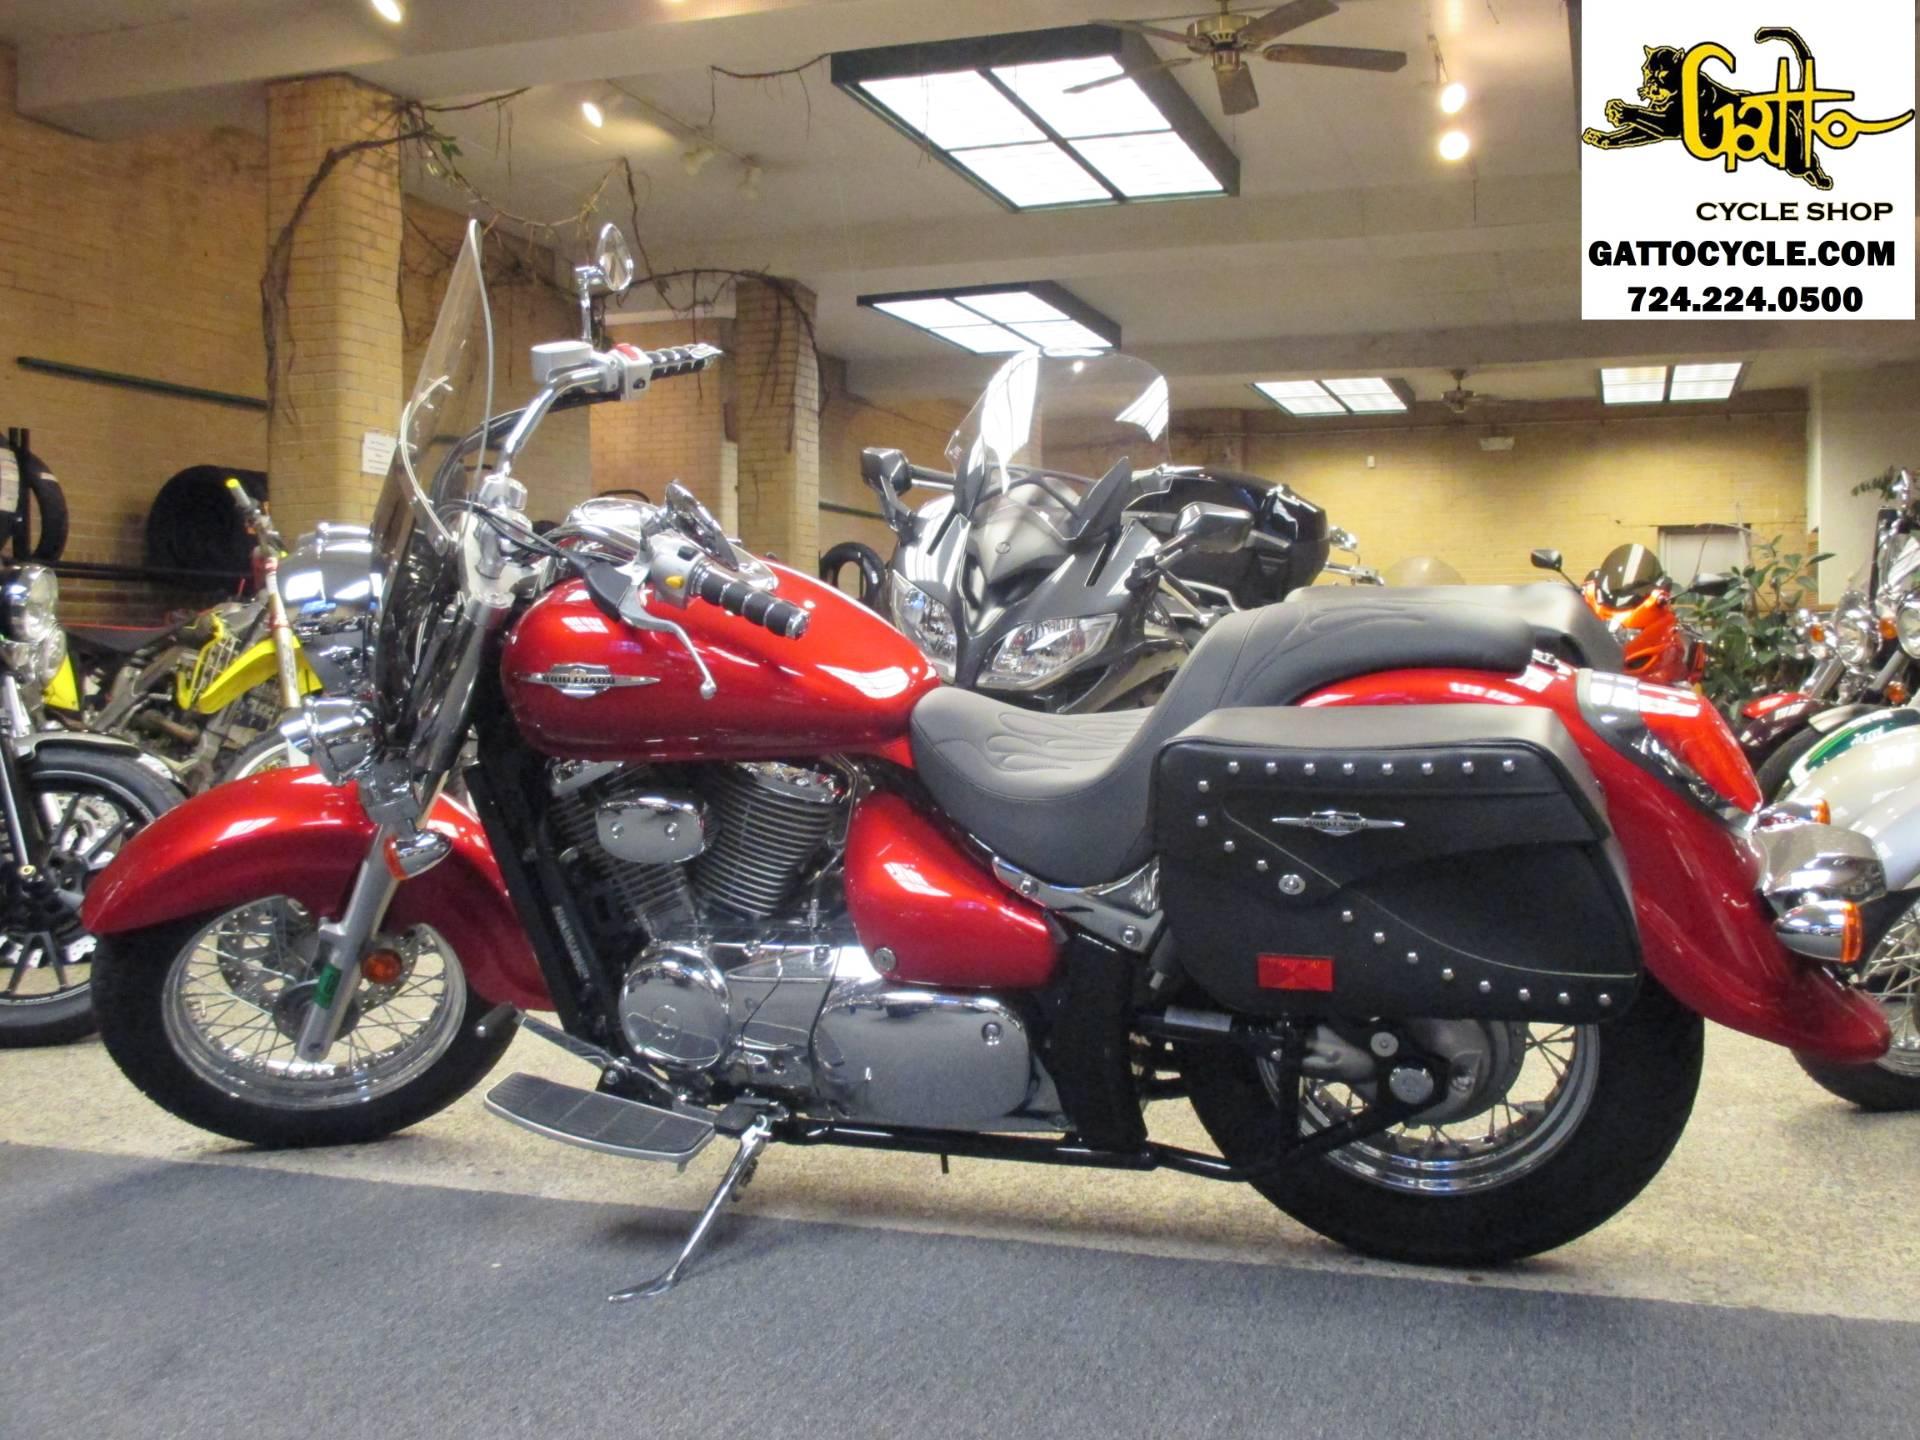 Used 2015 Suzuki Boulevard C50 Motorcycles in Tarentum, PA   Stock ...